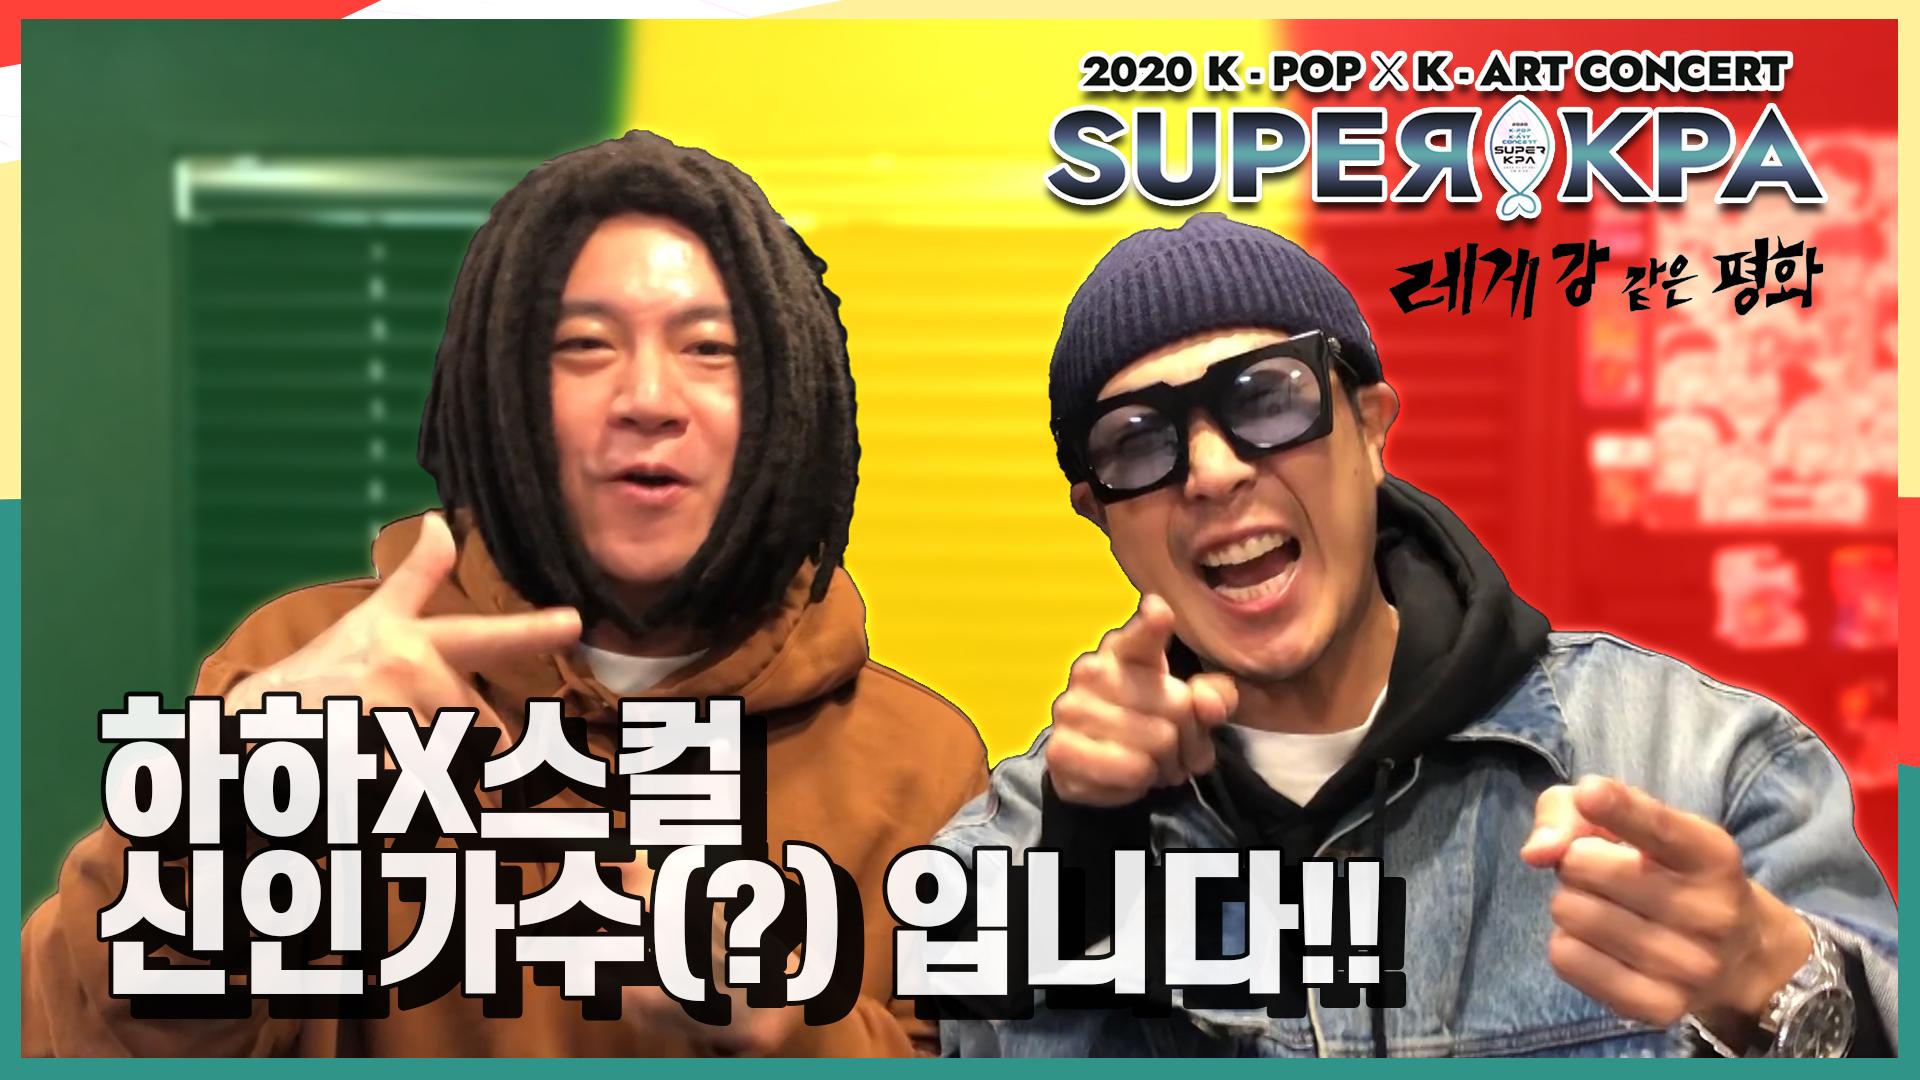 [Beyond LIVE - 2020 K-POP x K-ART CONCERT SUPER KPA] - 하하 X 스컬